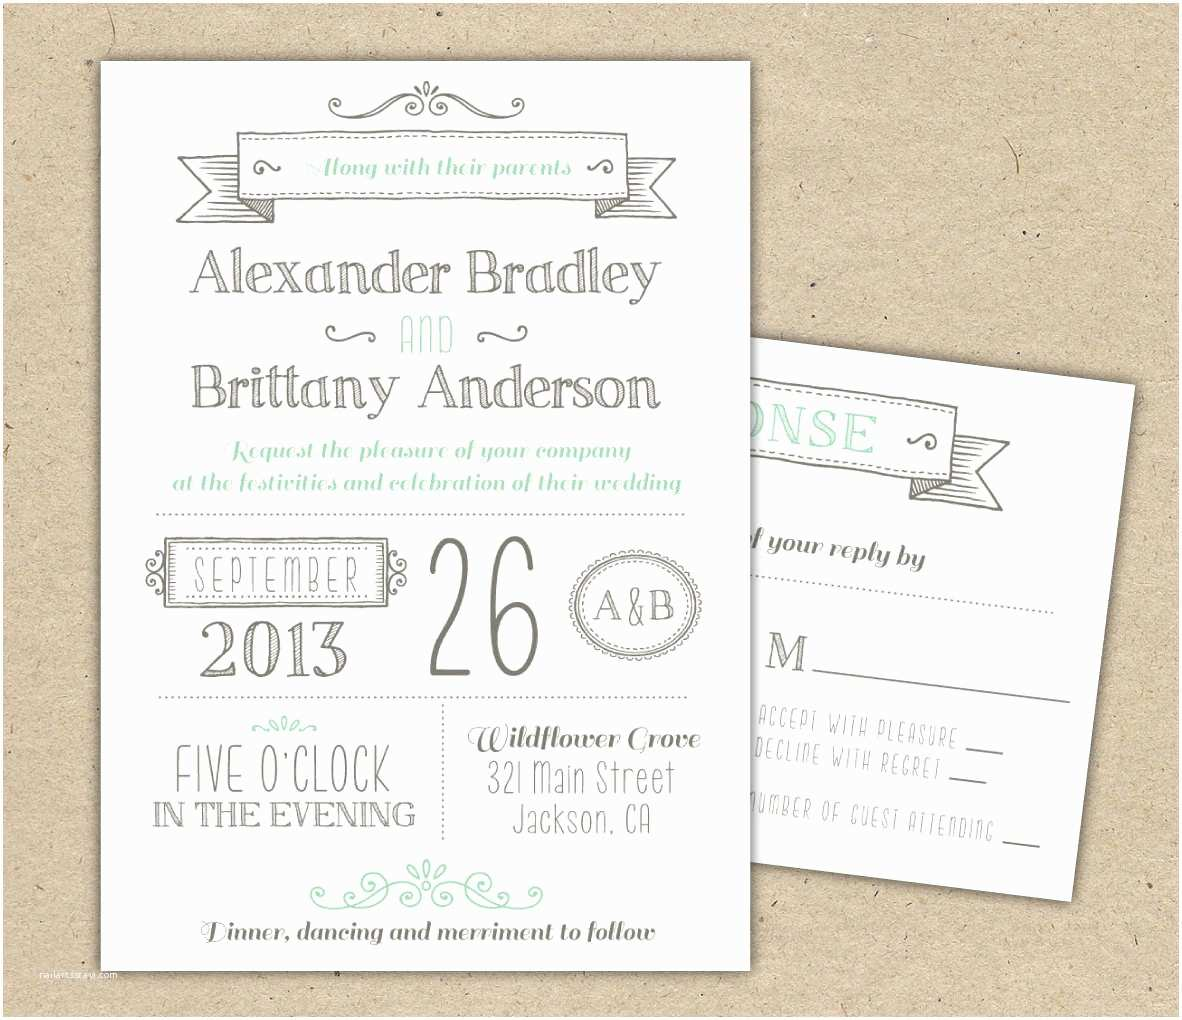 Wedding Invitation Designs top Pilation Free Printable Wedding Invitation